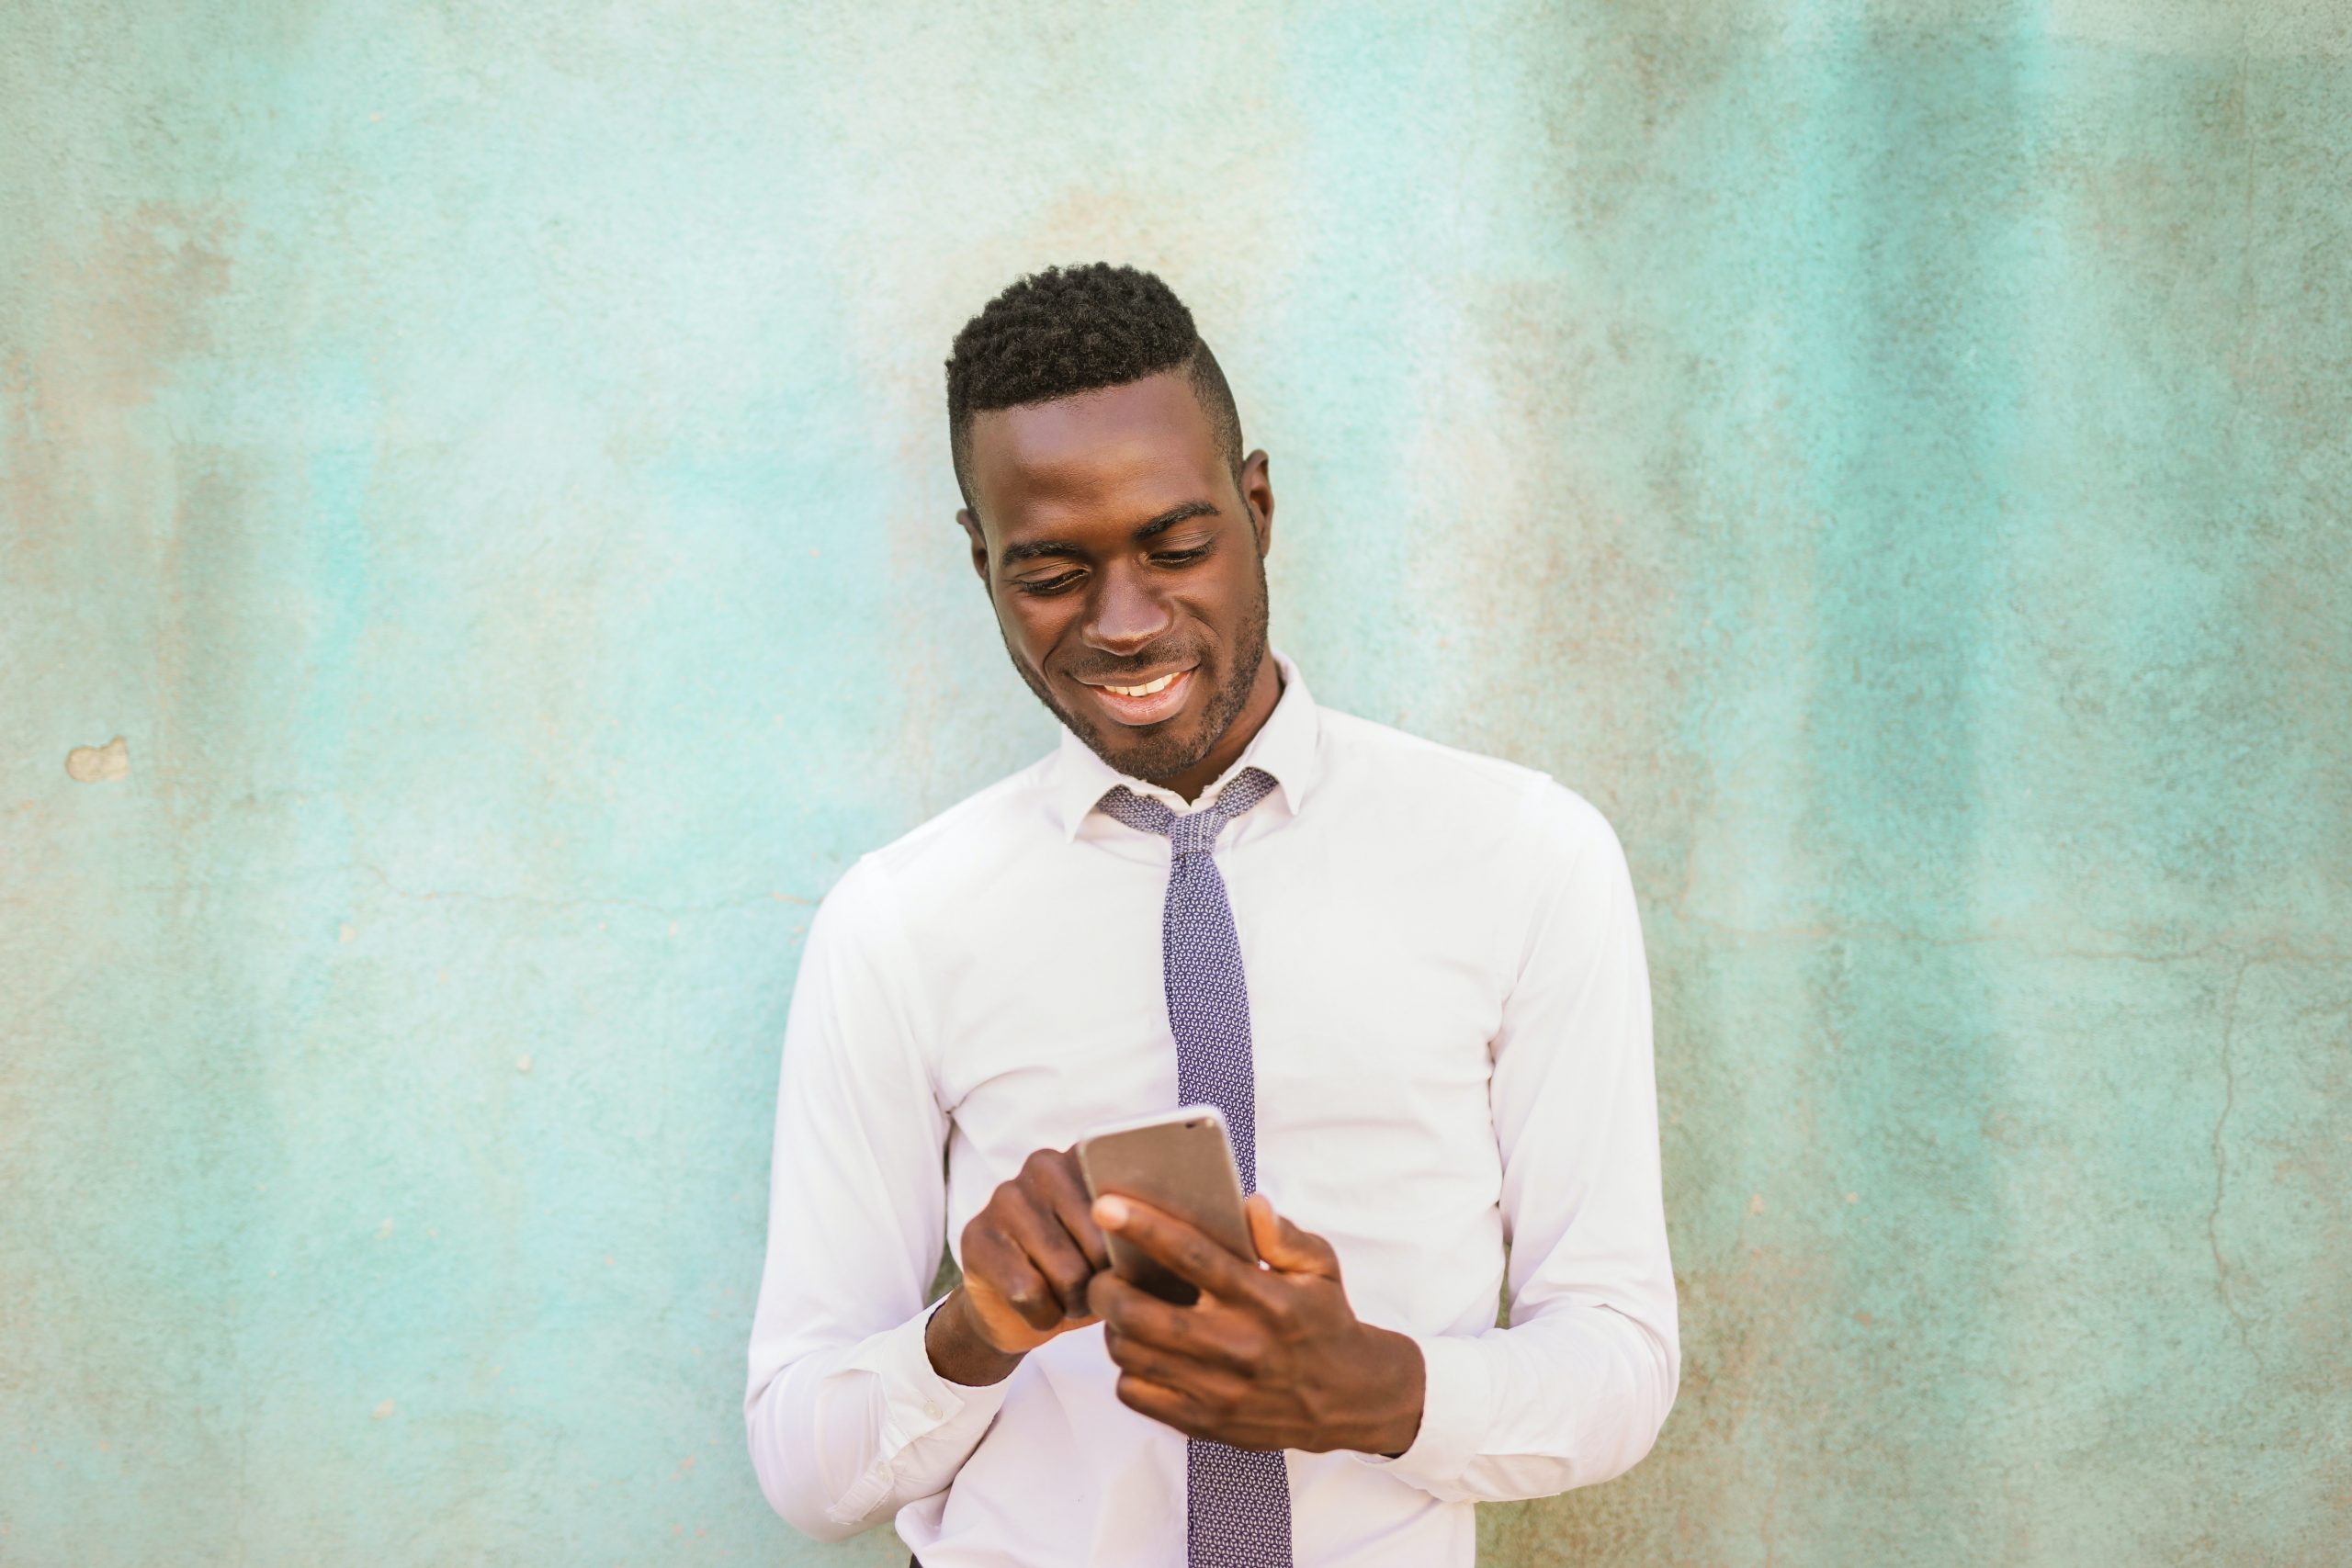 social media platforms can cause good and bad